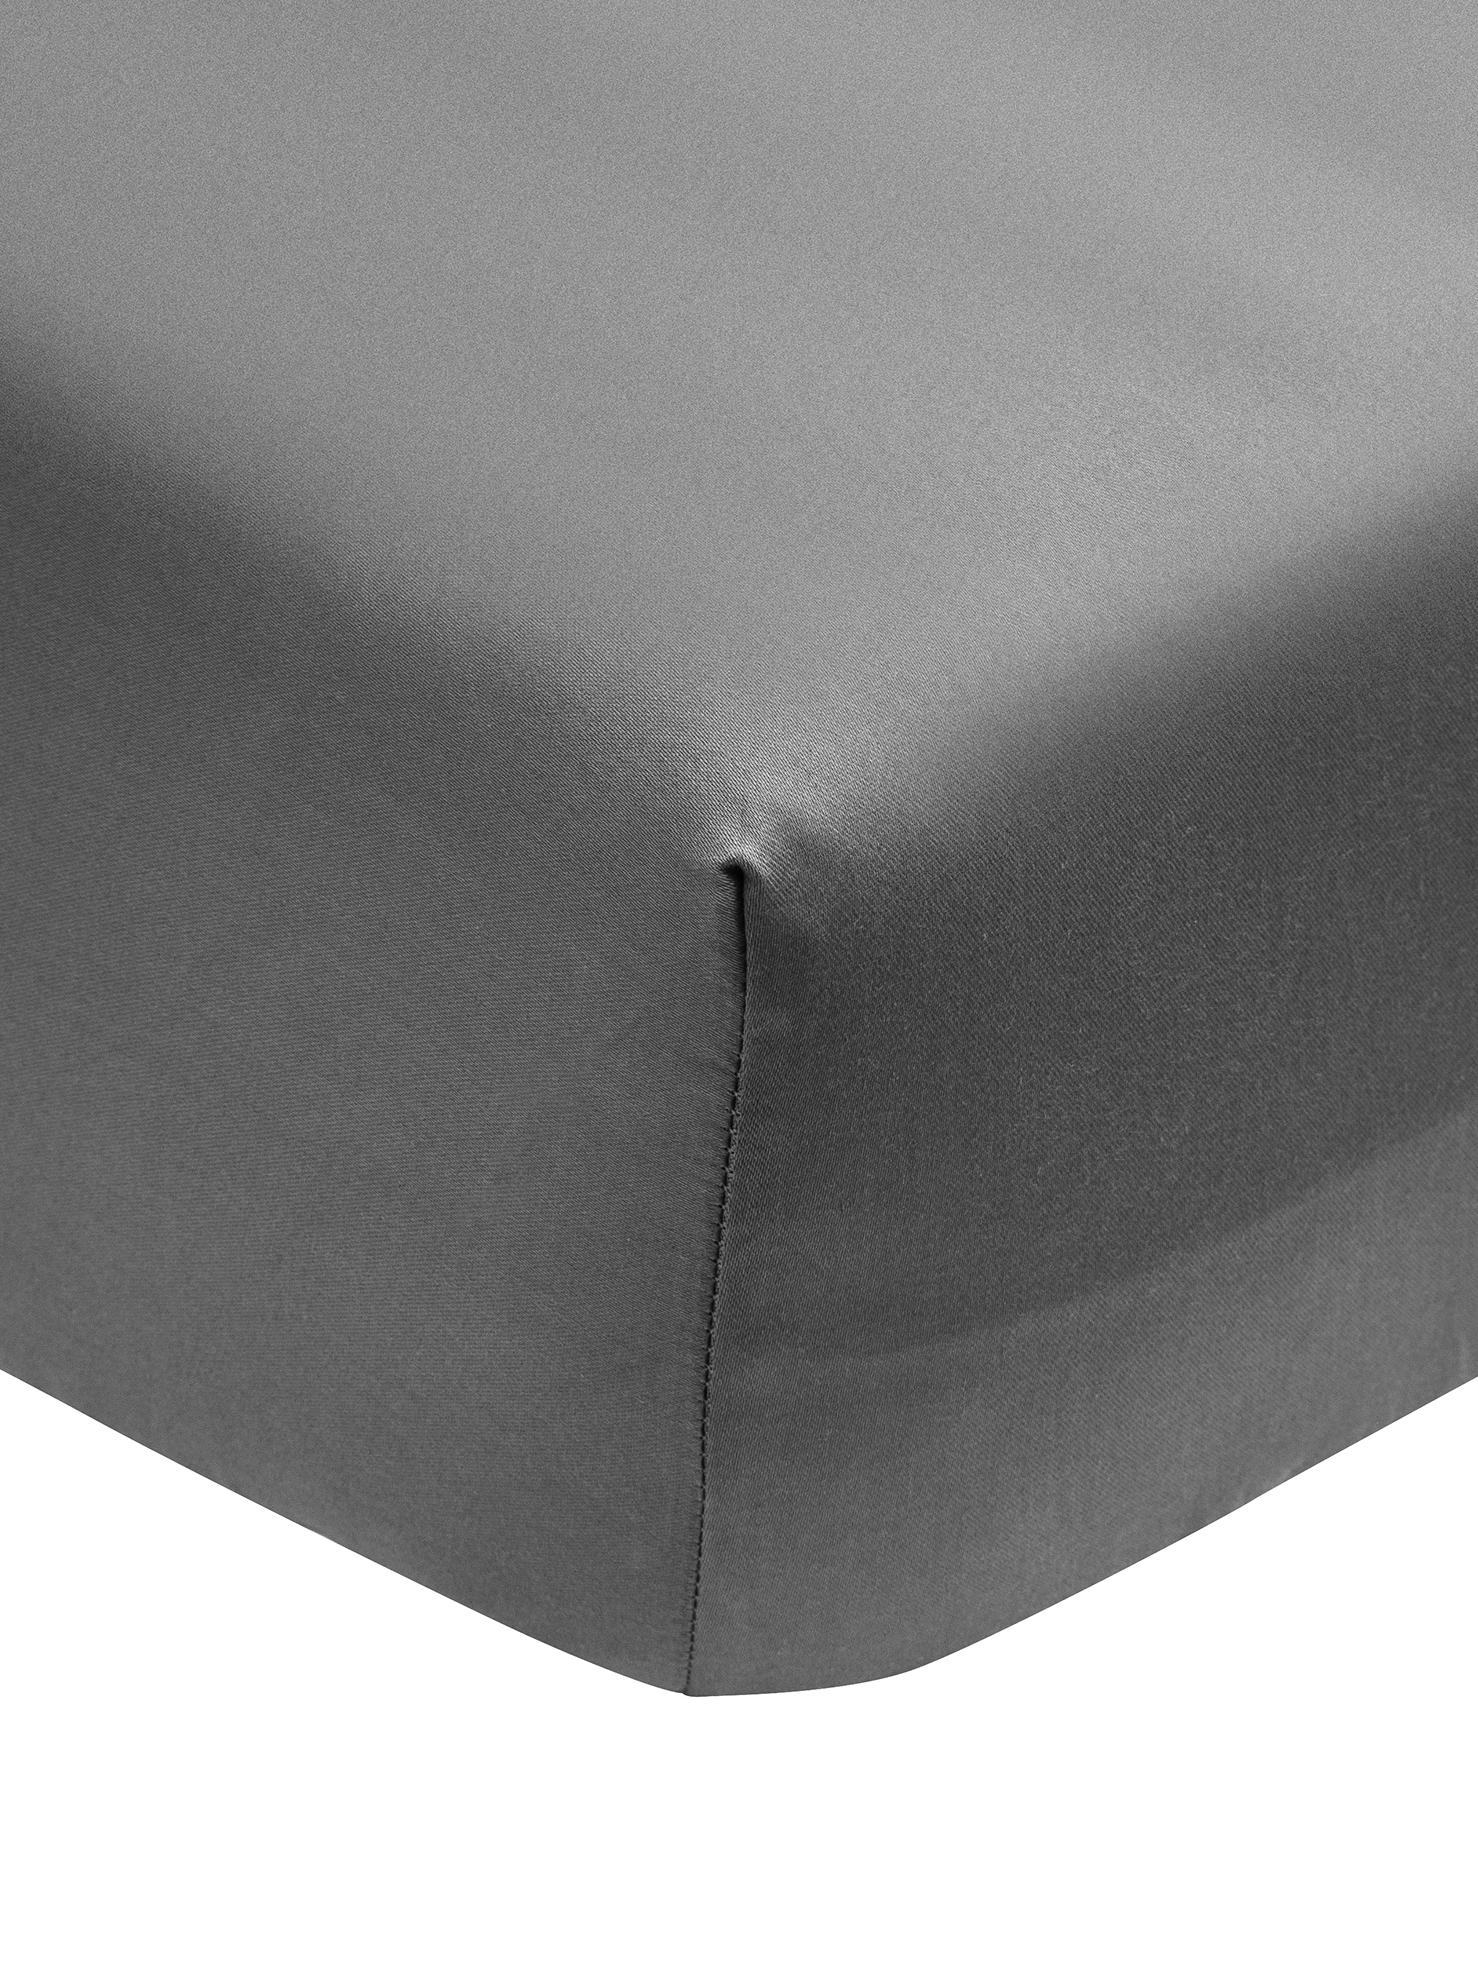 Sábana bajera de satén Premium, Gris oscuro, Cama 90 cm (90 x 200 cm)